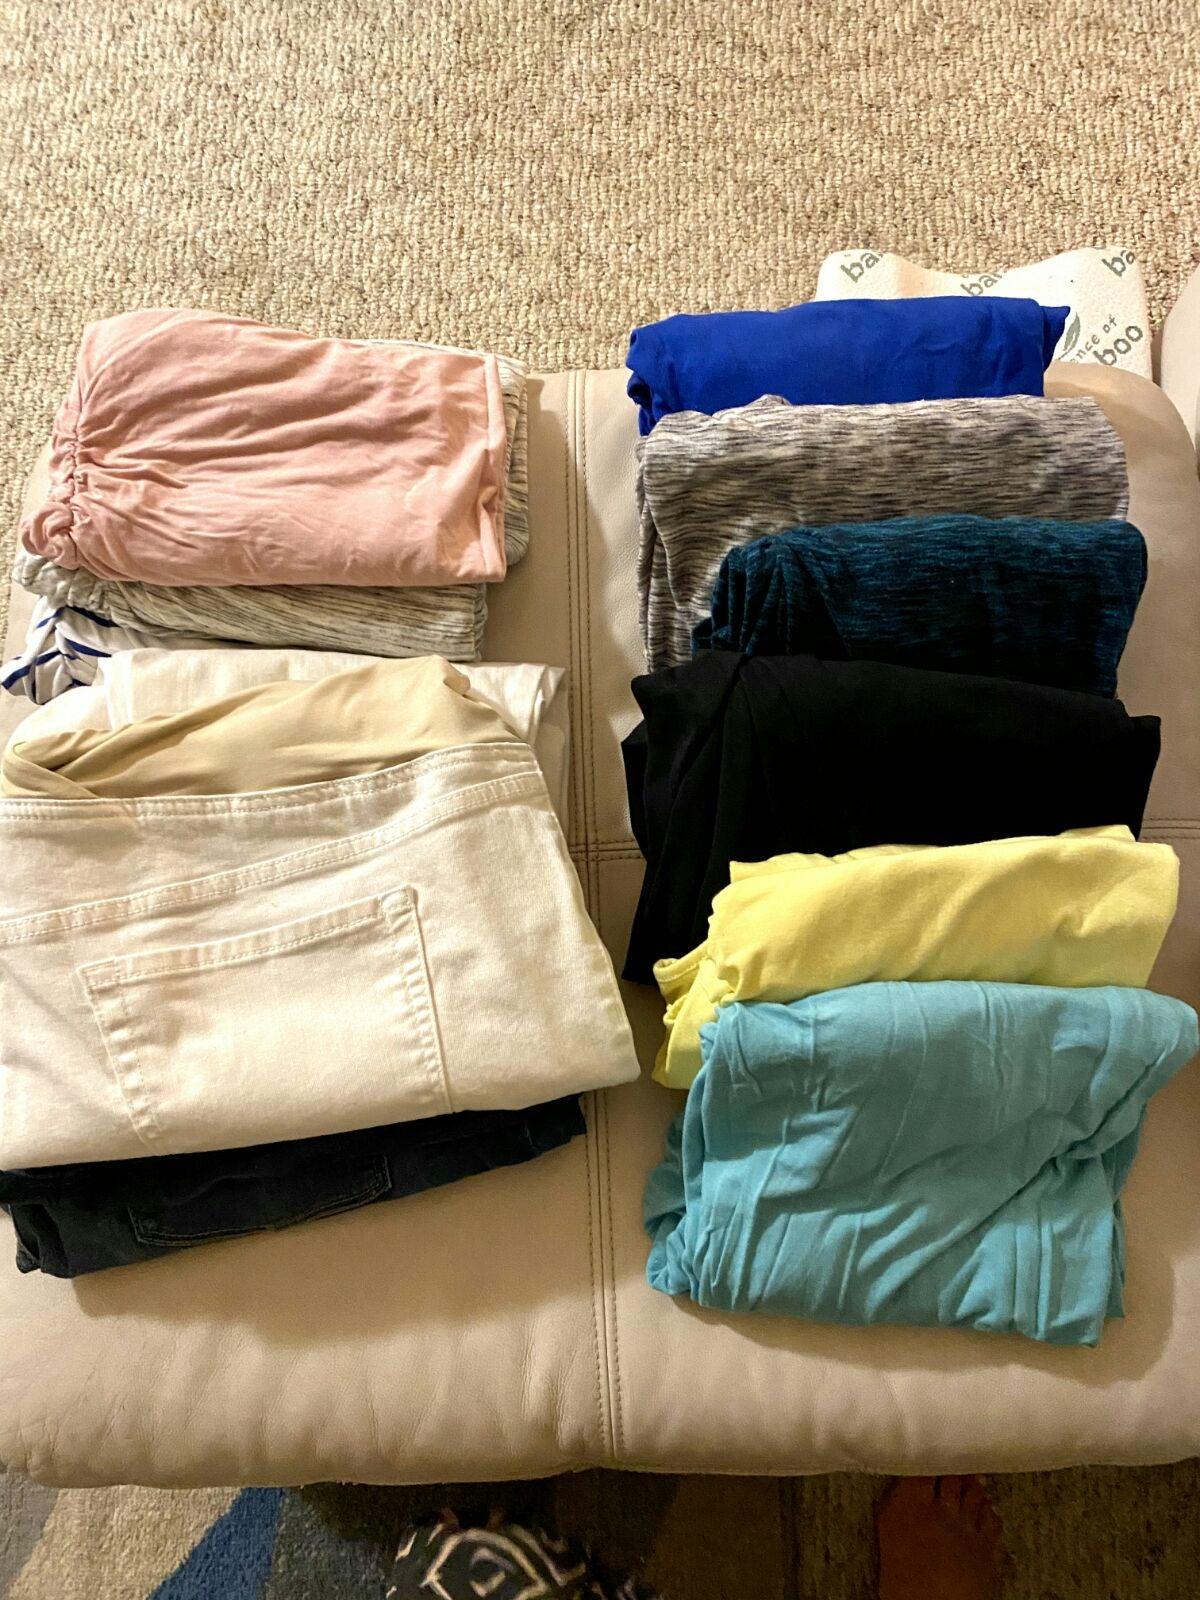 Maternity bundle